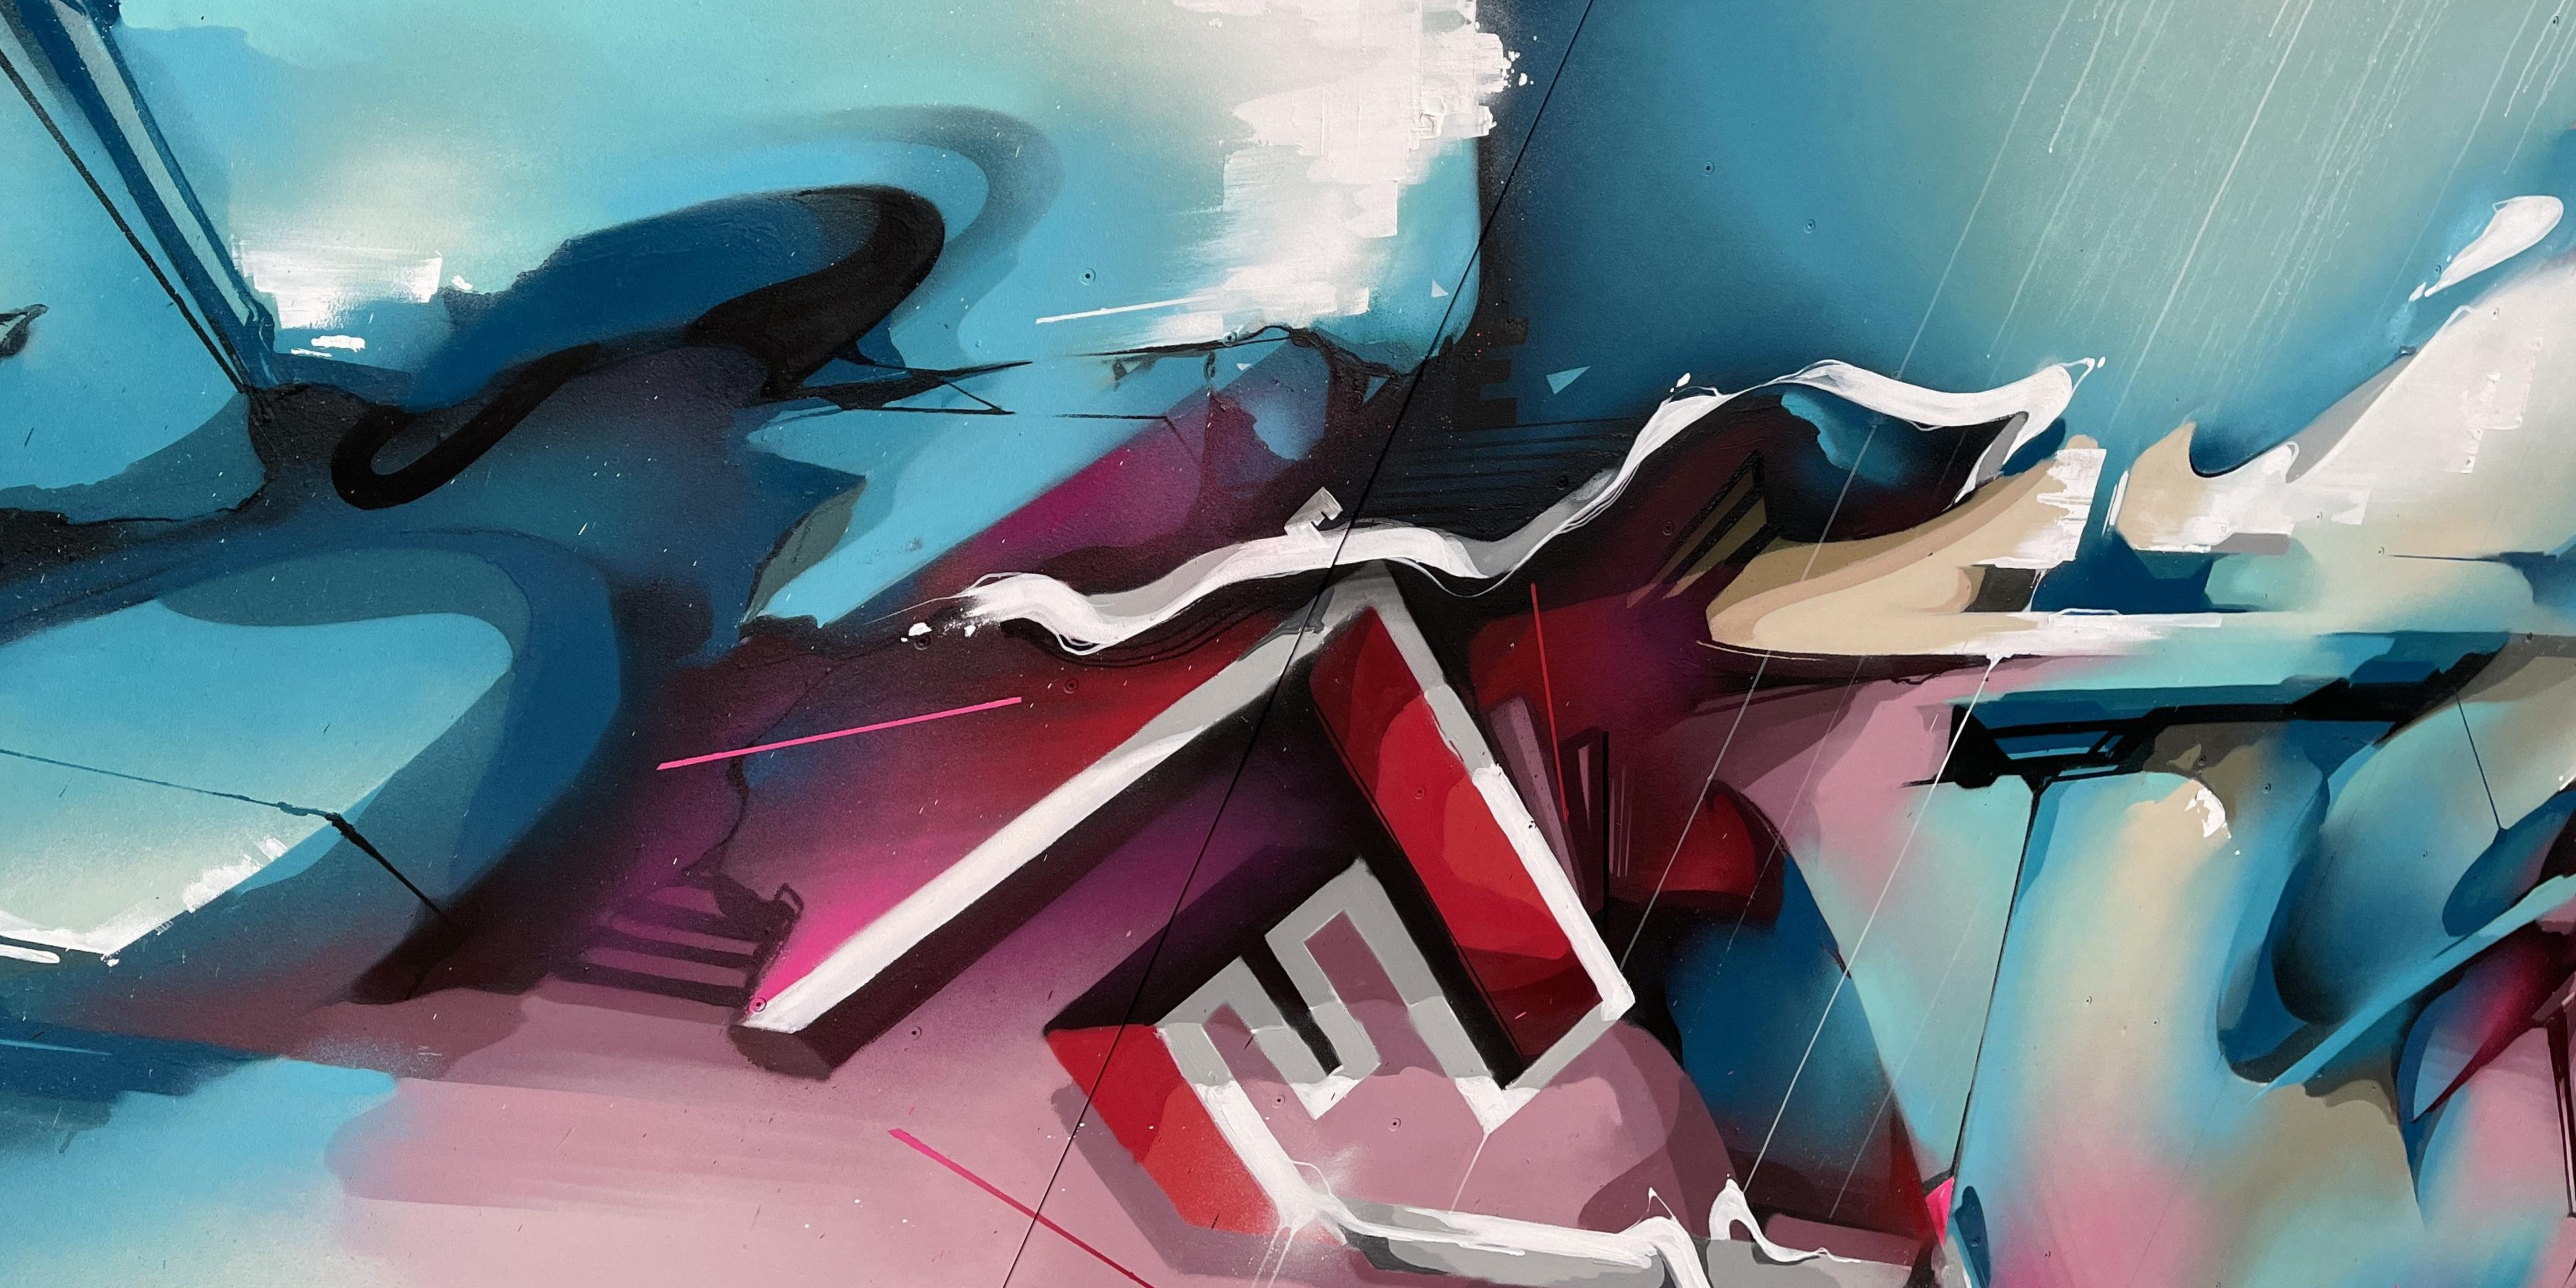 A work by Does - Hütterscheid, Germany_thumb